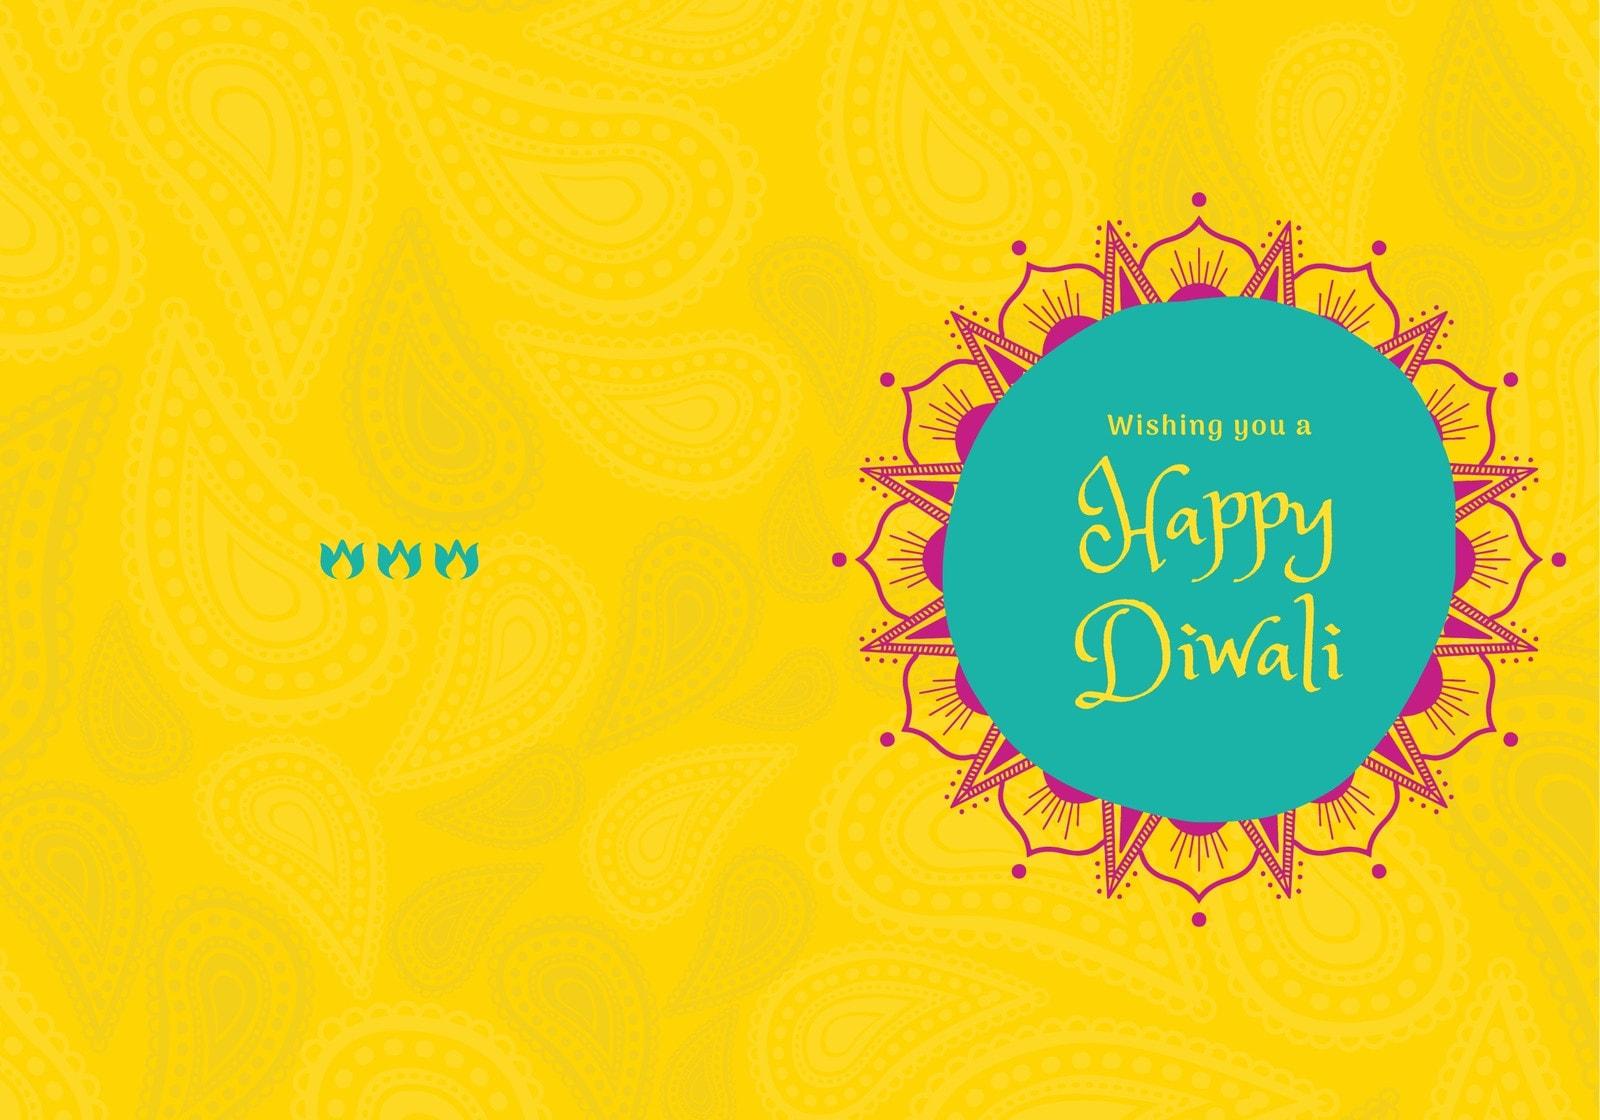 Yellow, Pink and Teal Minimal Diwali Folded Card